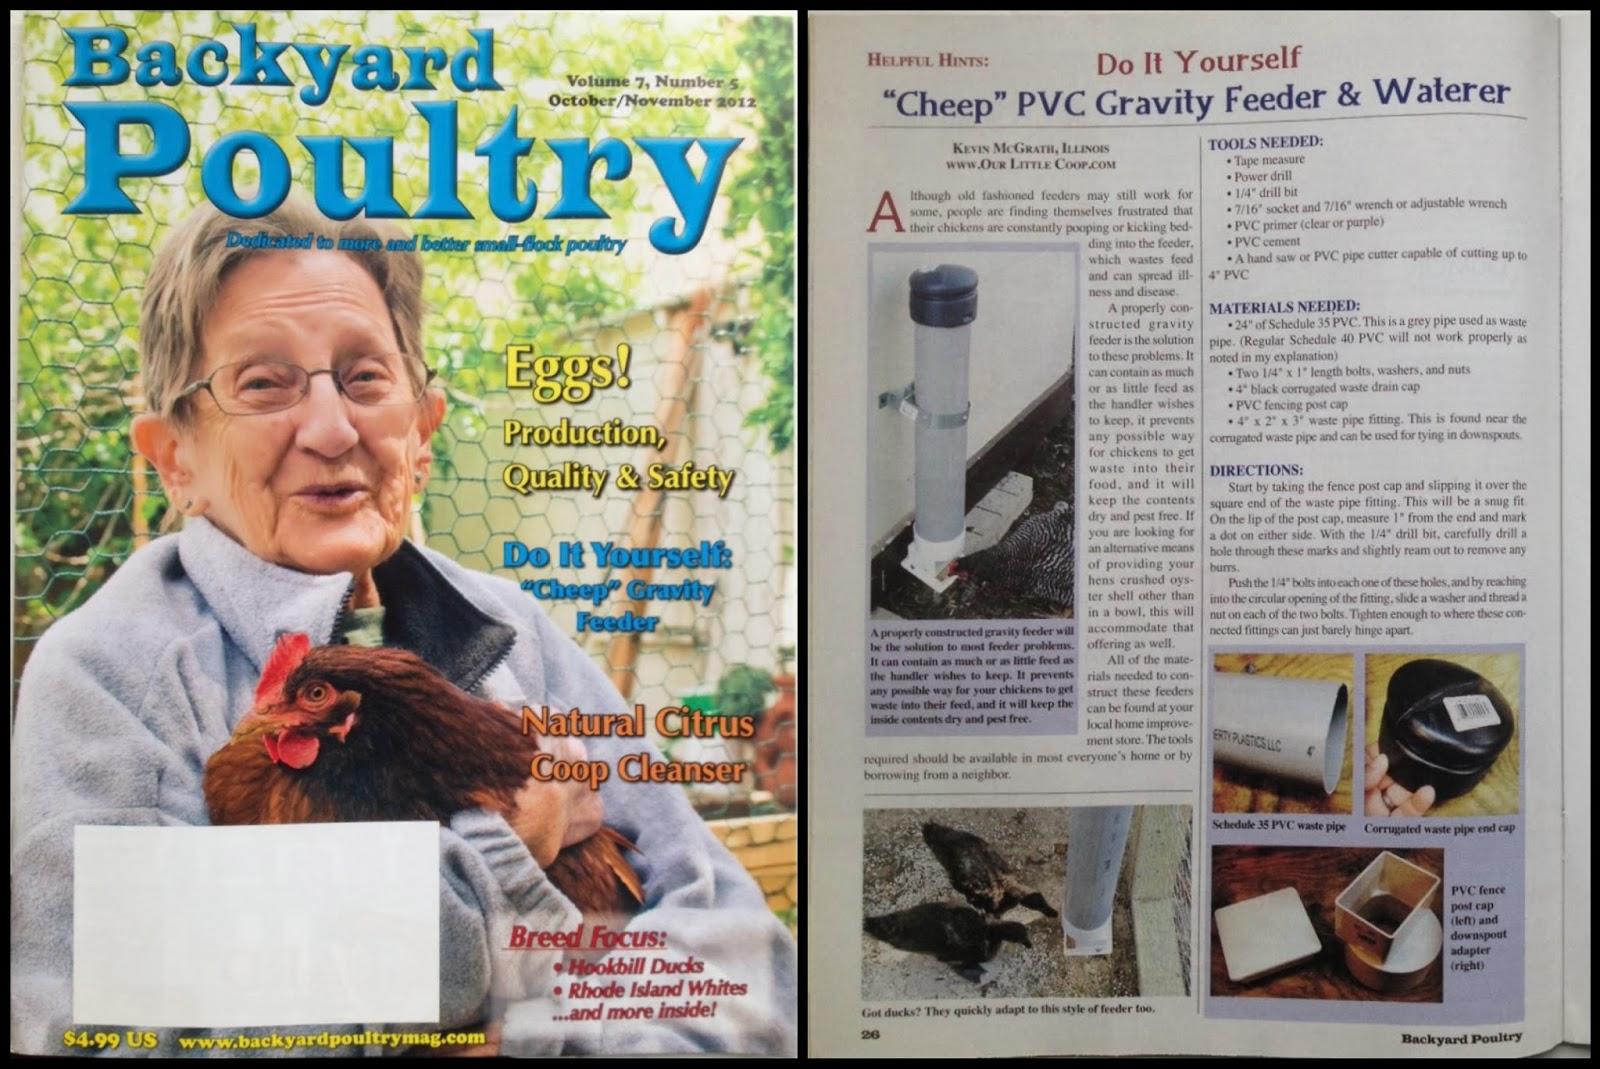 backyard poultry magazine october november 2012 edition helpful hints